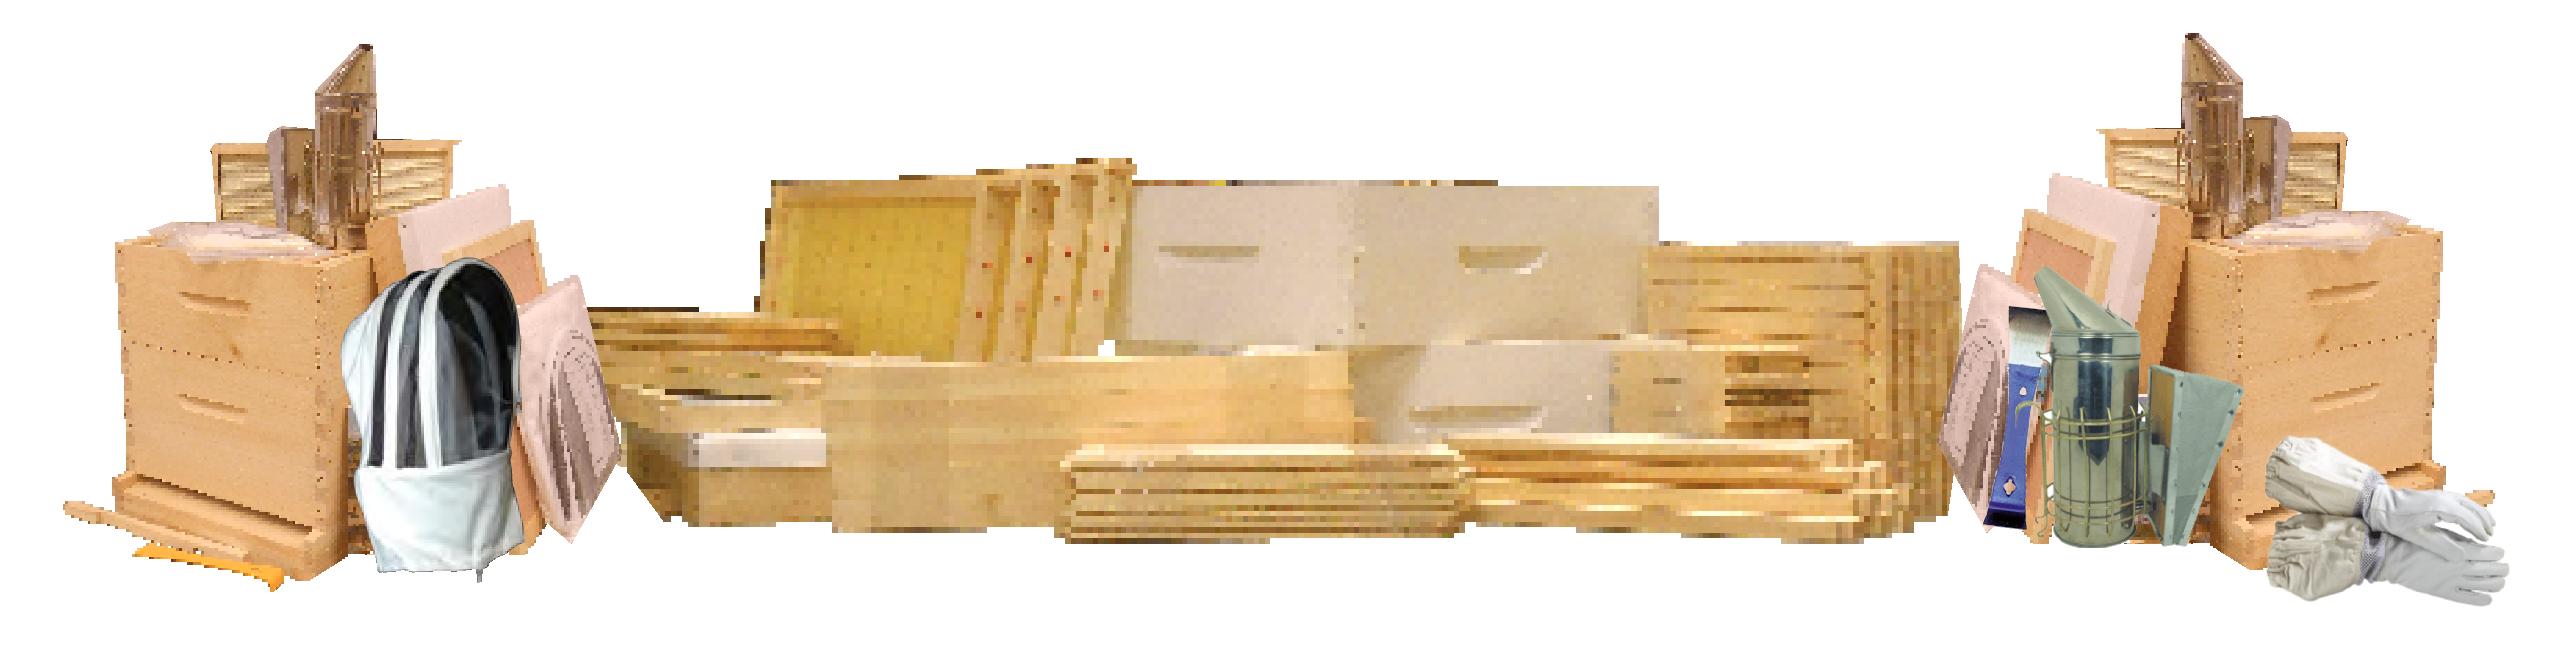 woodenware-01